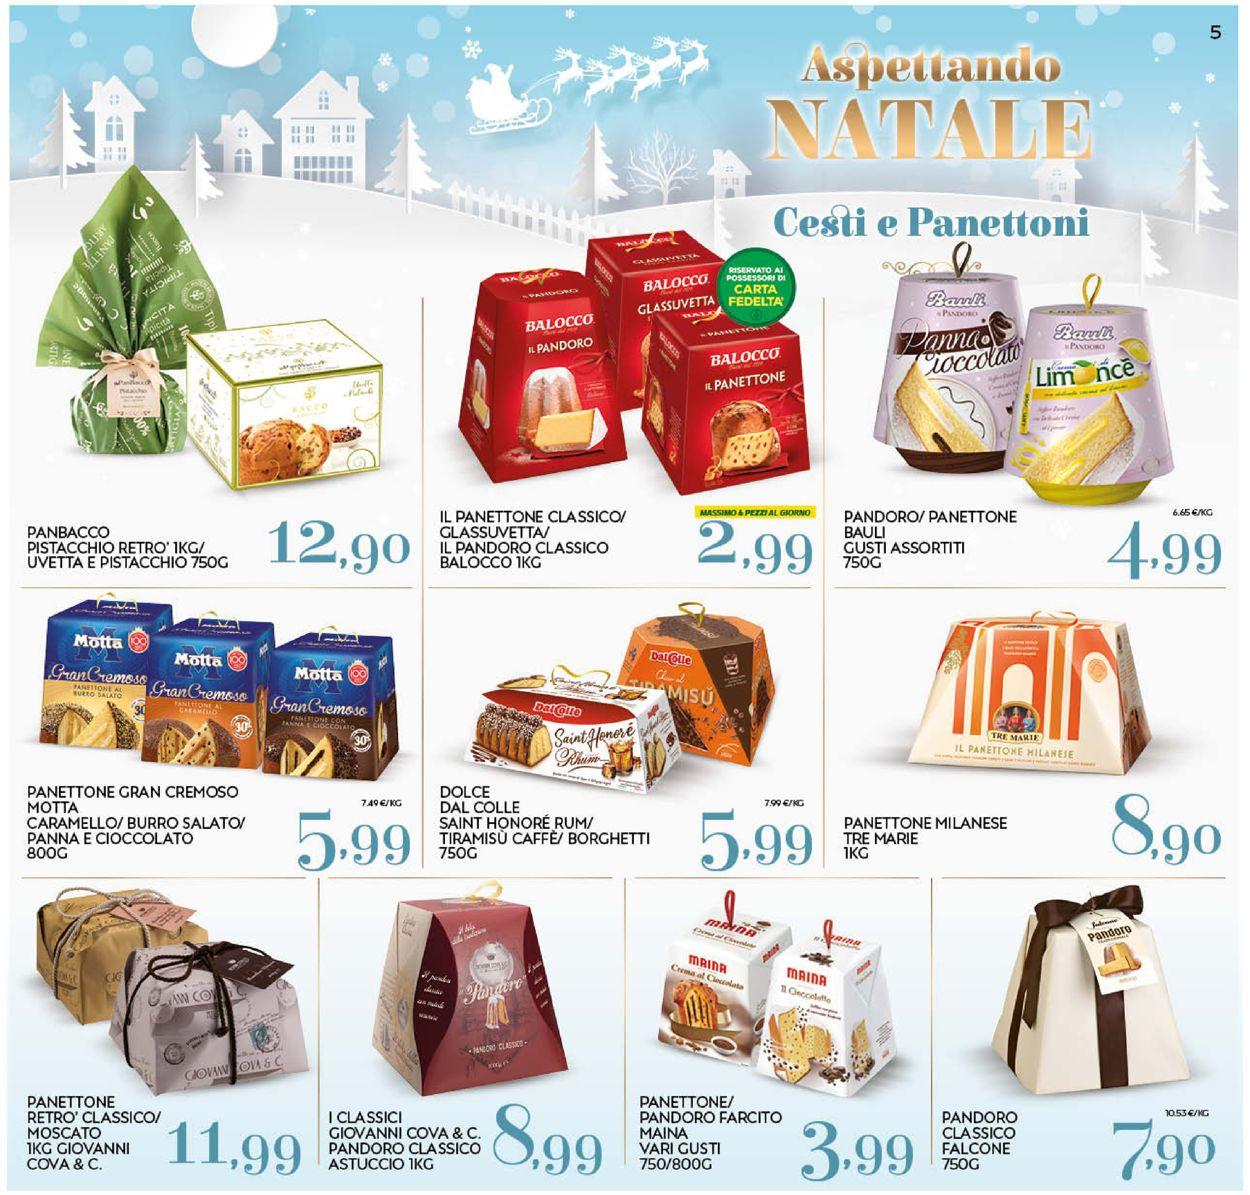 Volantino Despar - Natale 2020 - Offerte 03/12-15/12/2020 (Pagina 5)